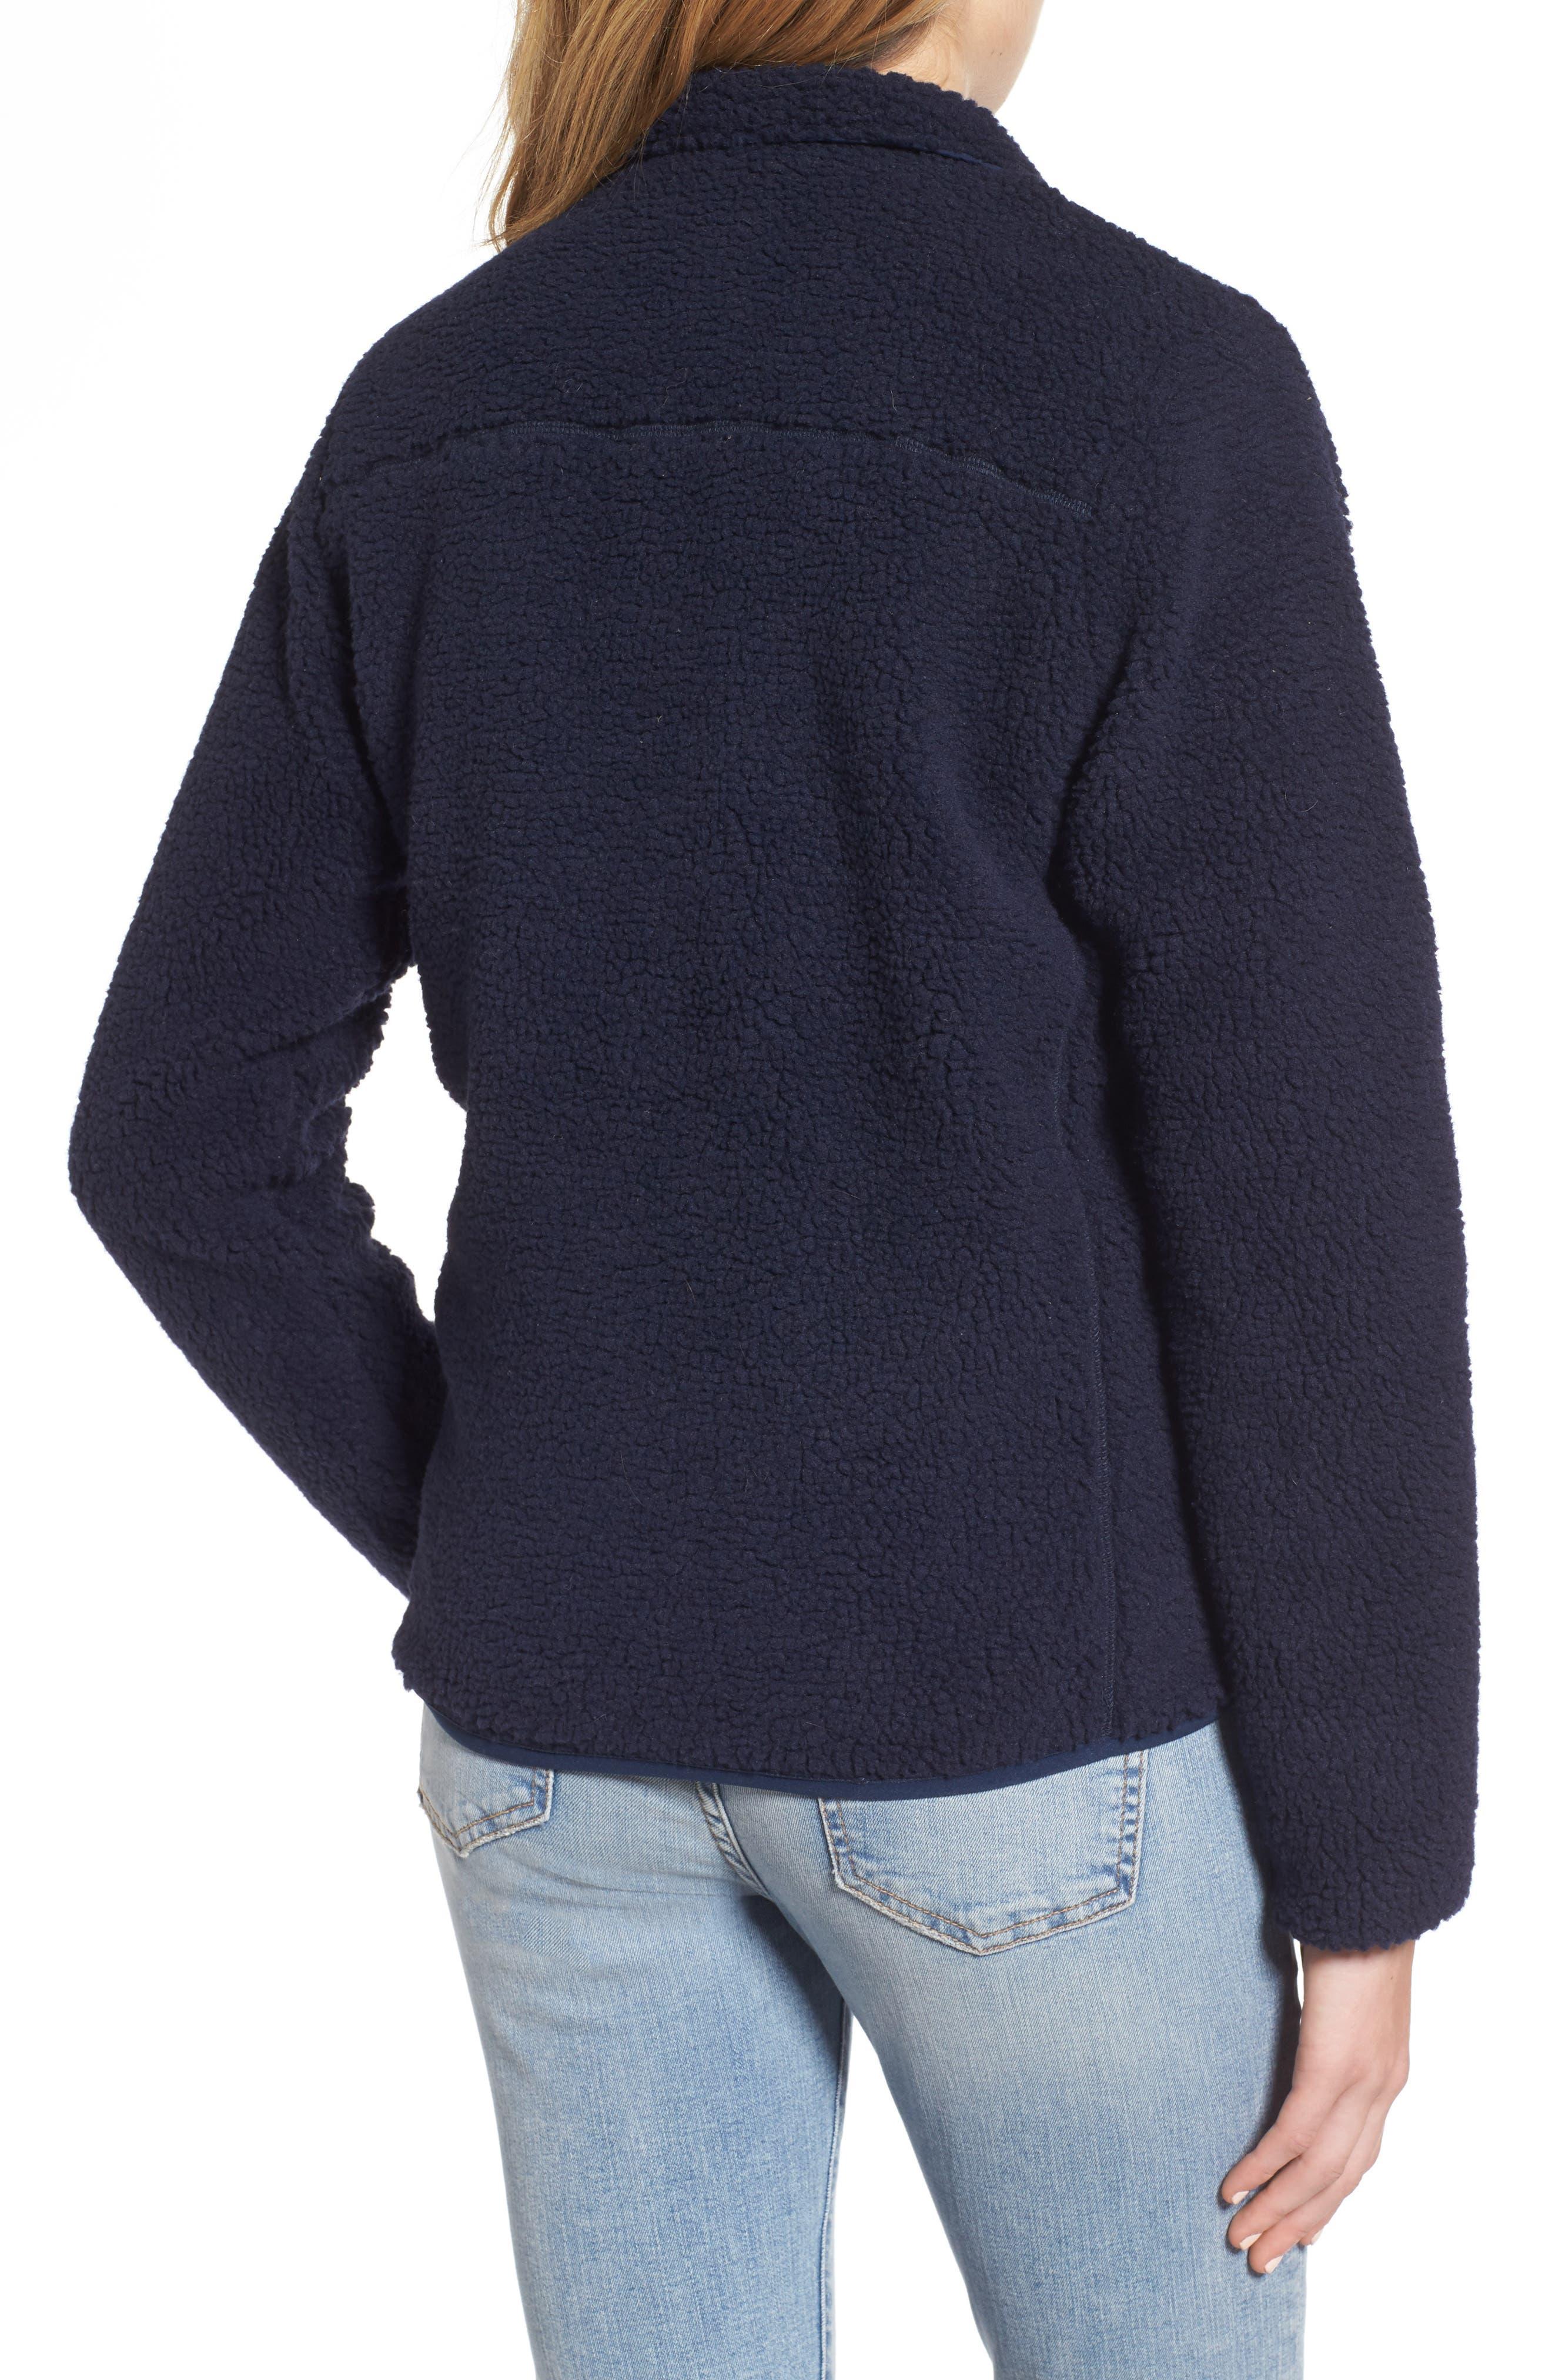 Mattawa Fleece Jacket,                             Alternate thumbnail 2, color,                             Navy